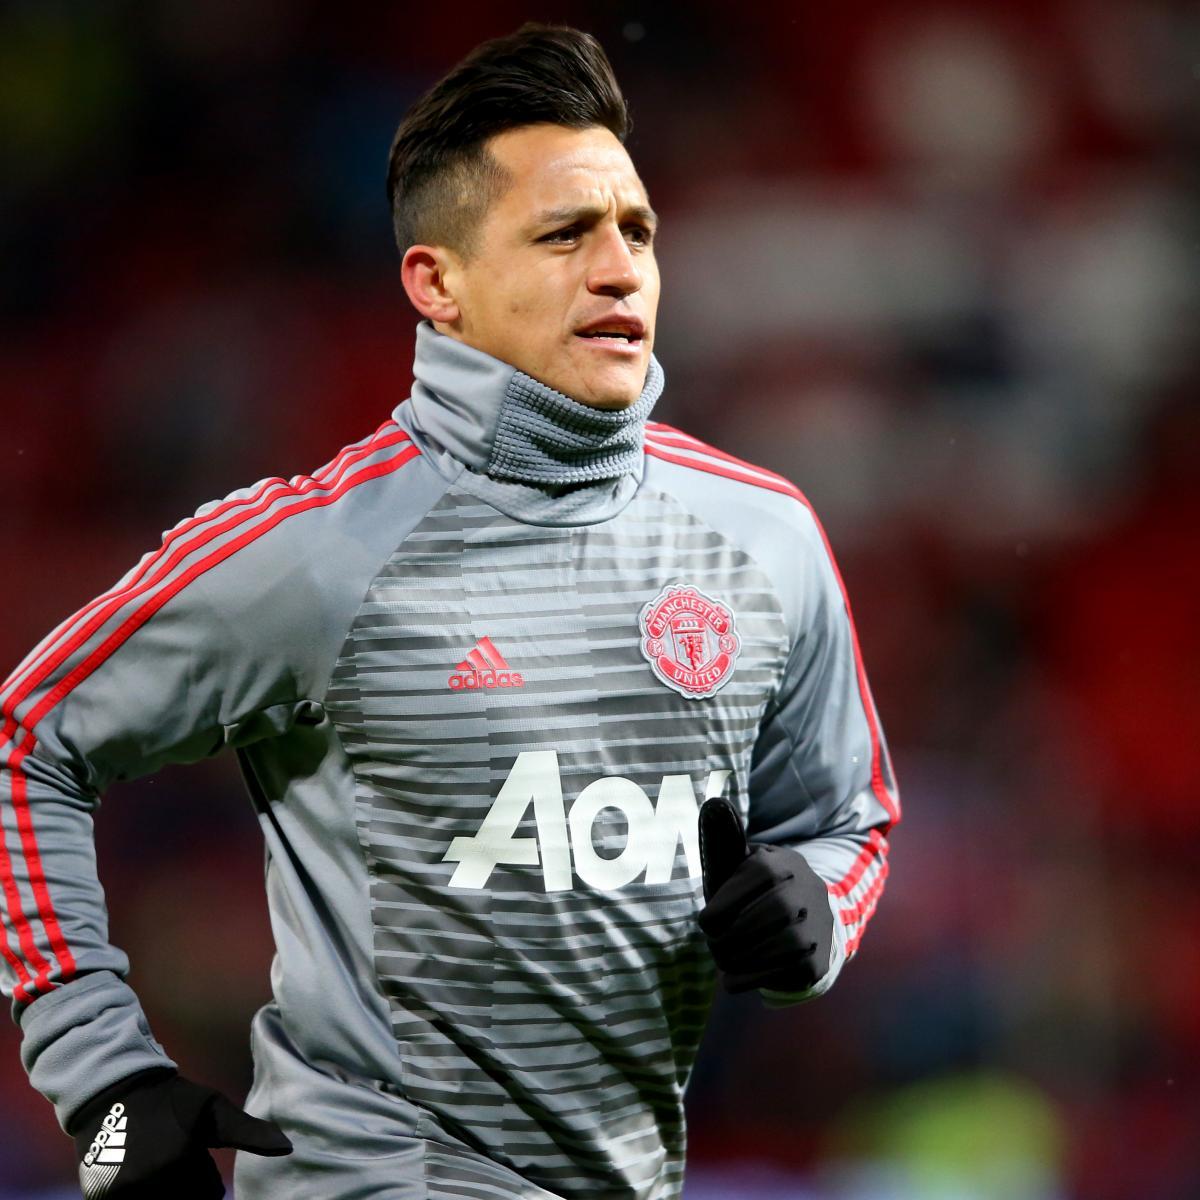 Manchester United Transfer News Alexis Sanchez Rumours: Alexis Sanchez Describes 'Difficult' Time After Manchester